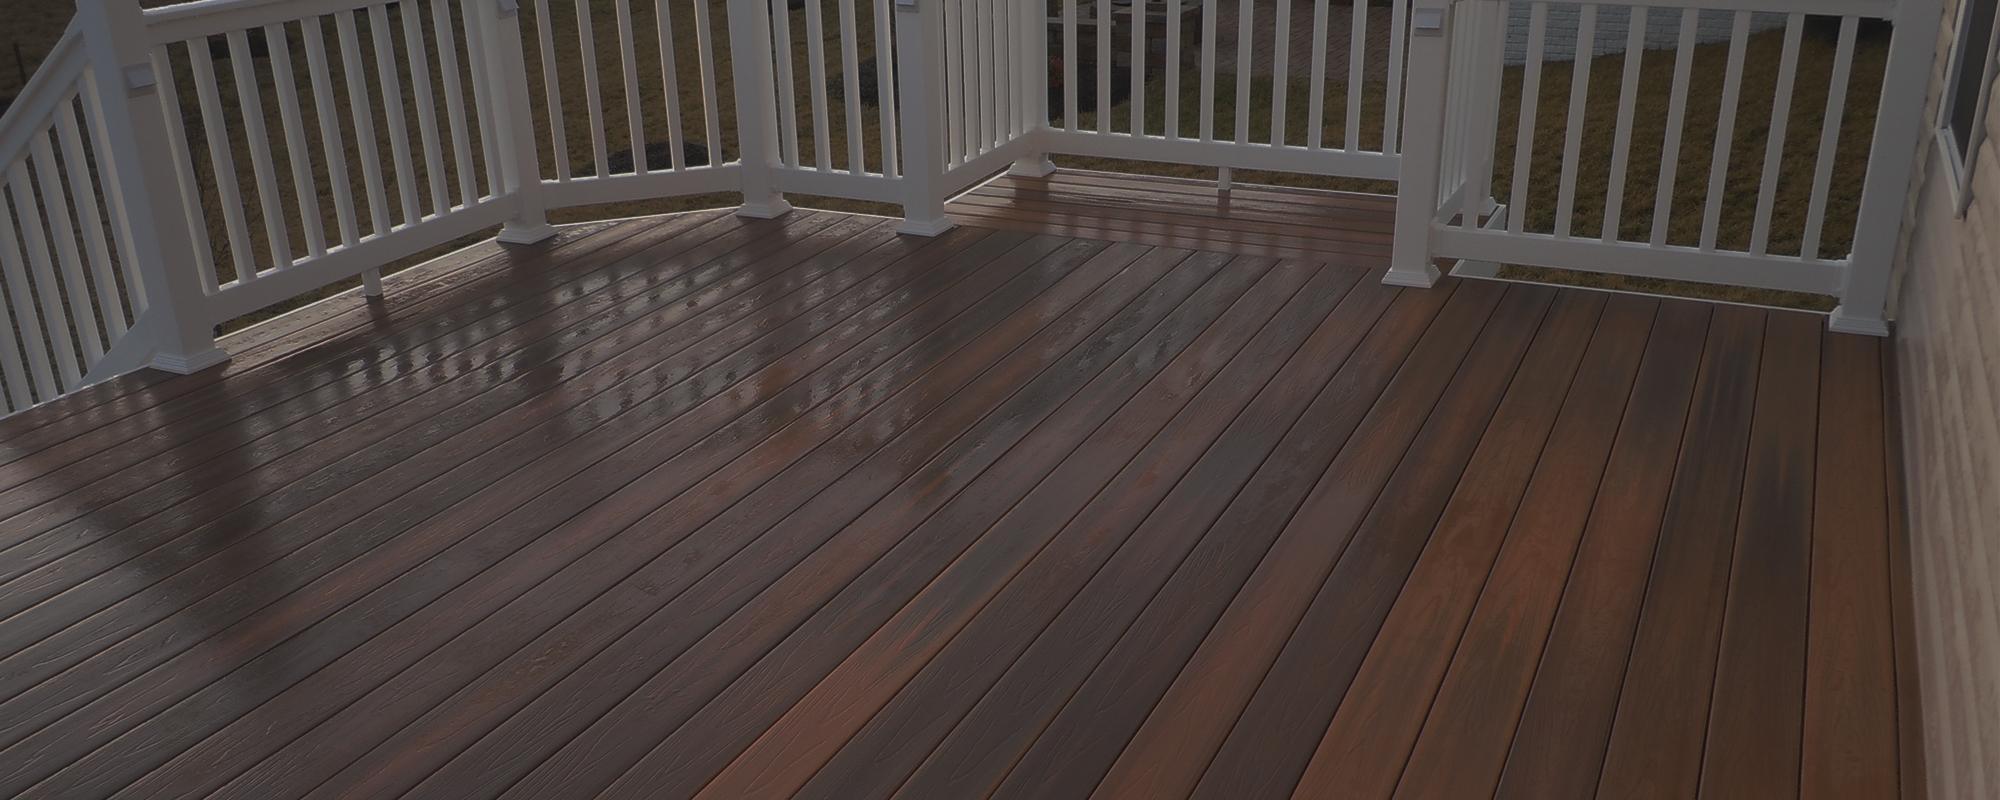 Deck And Fence Restoration Osullivans Pressure Washing